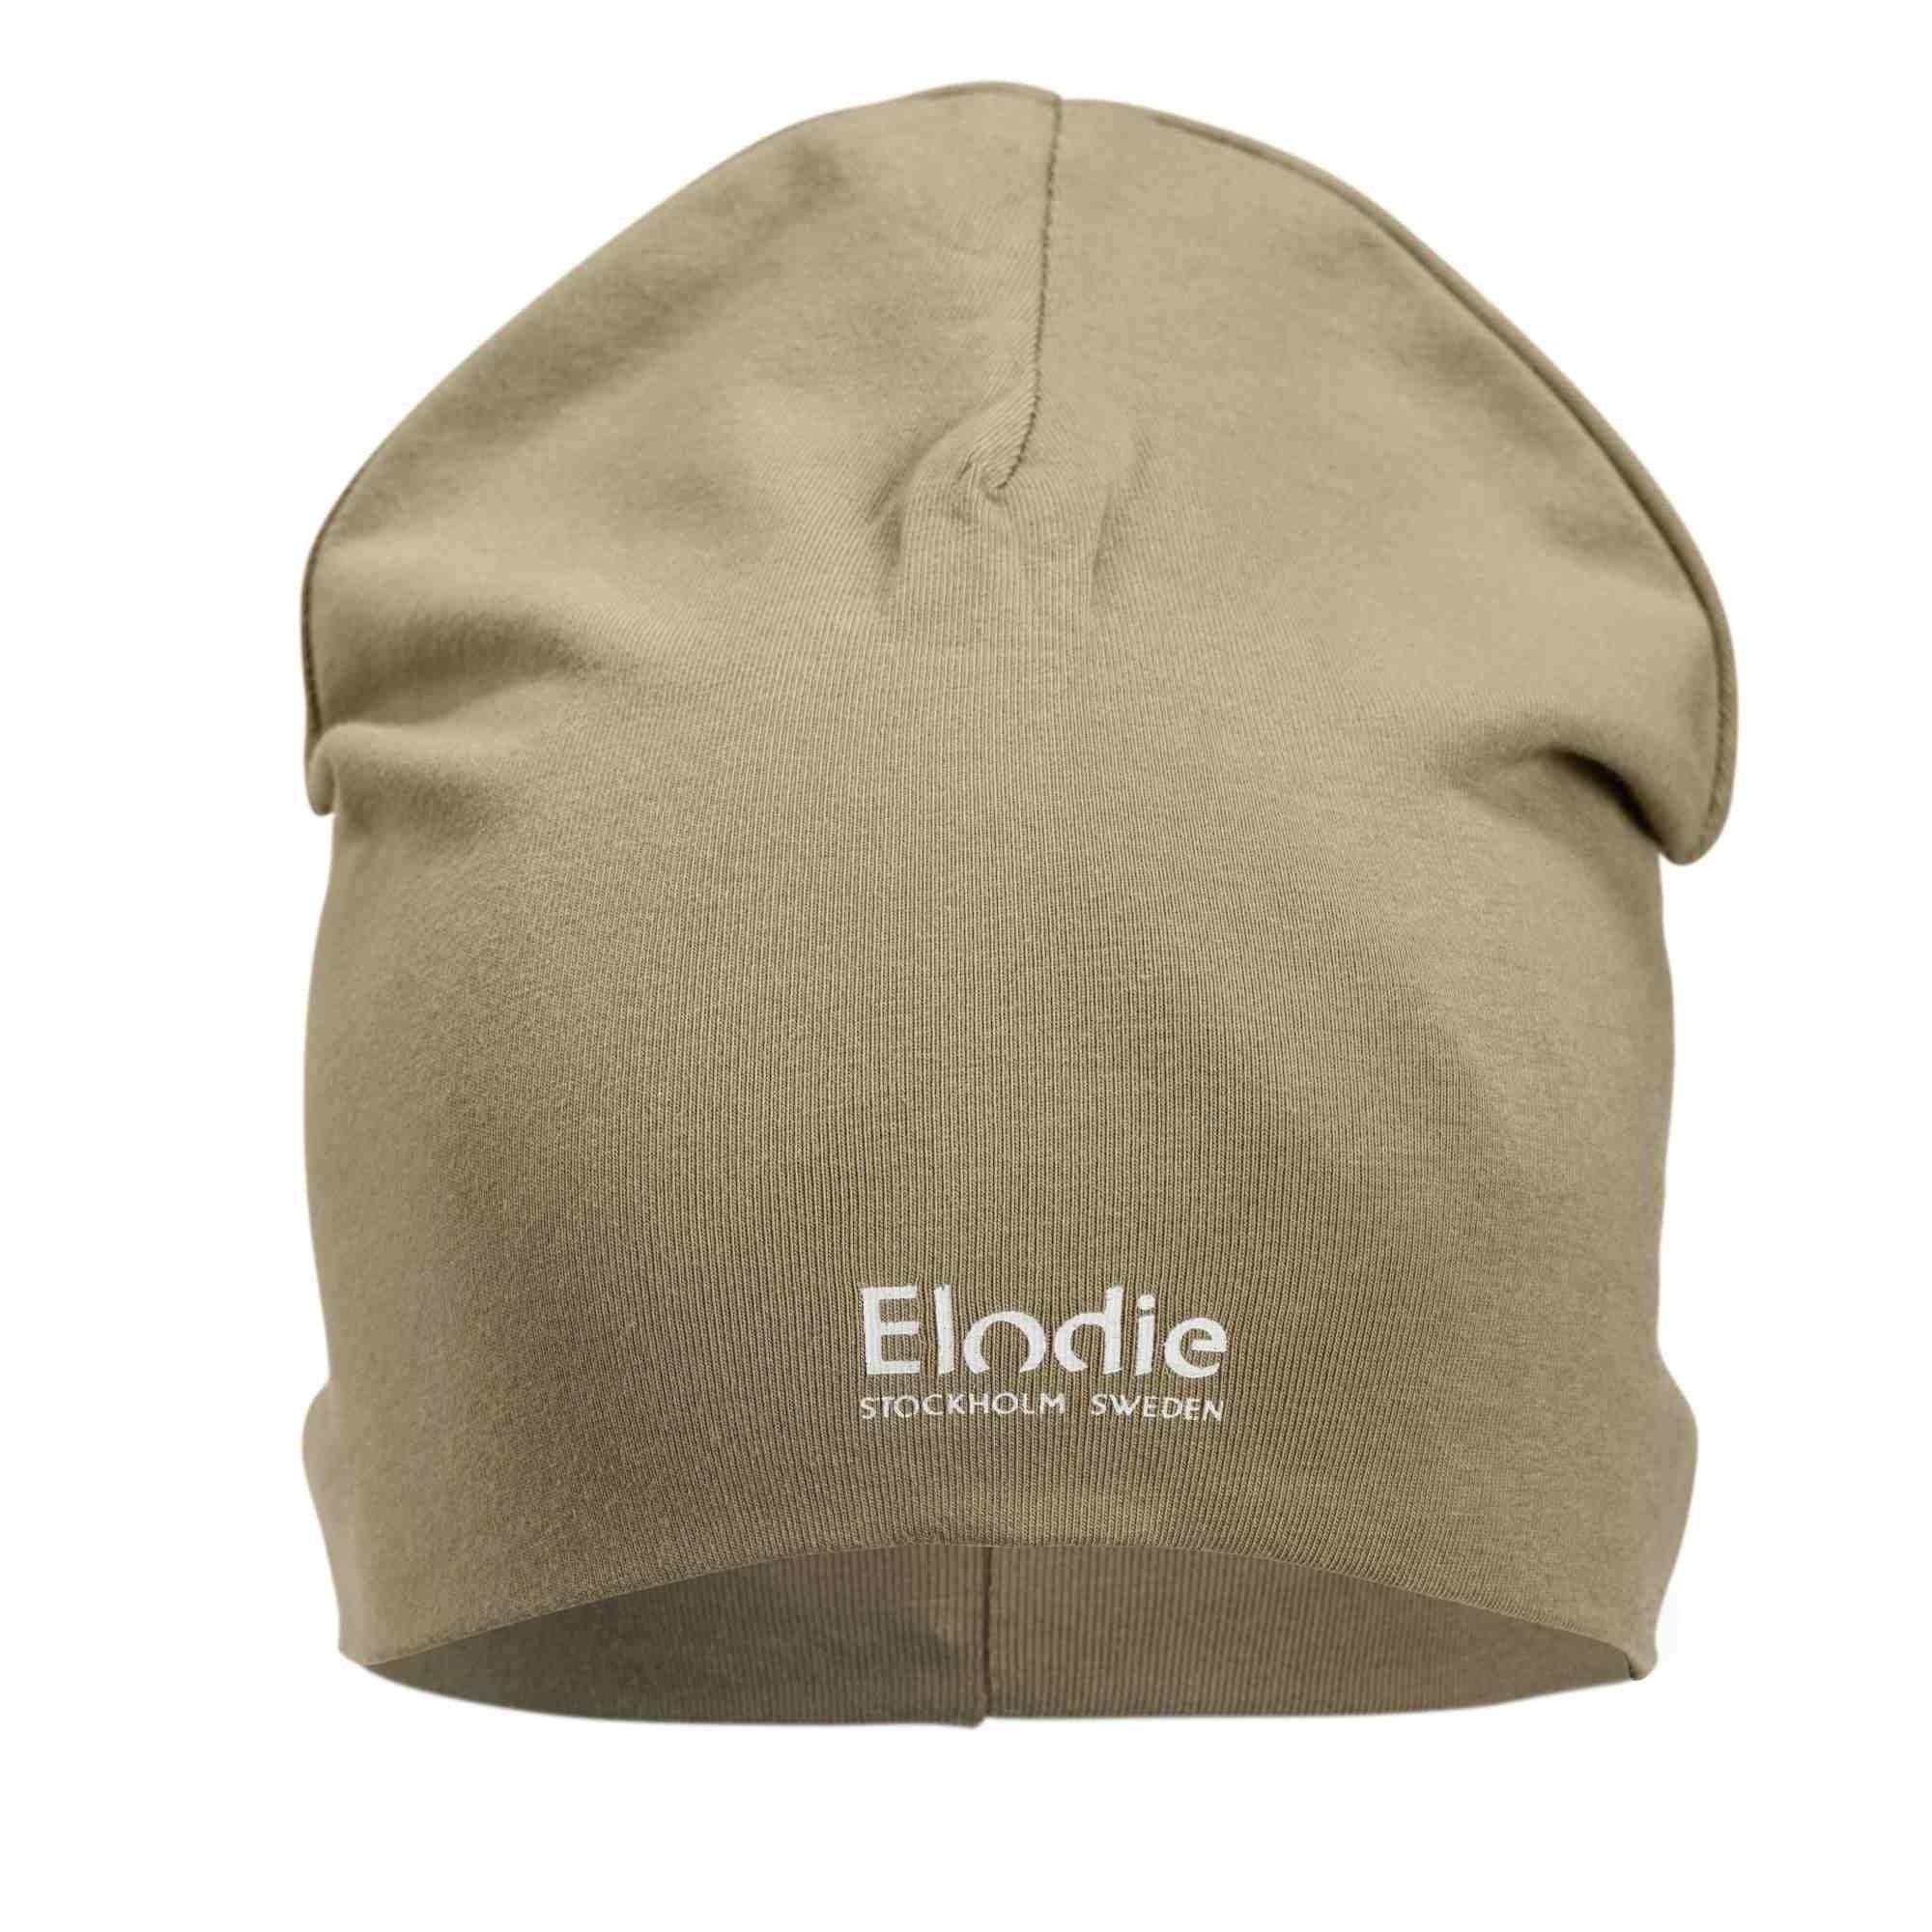 Elodie Details - Czapka - Warm Sand 0-6 m-cy